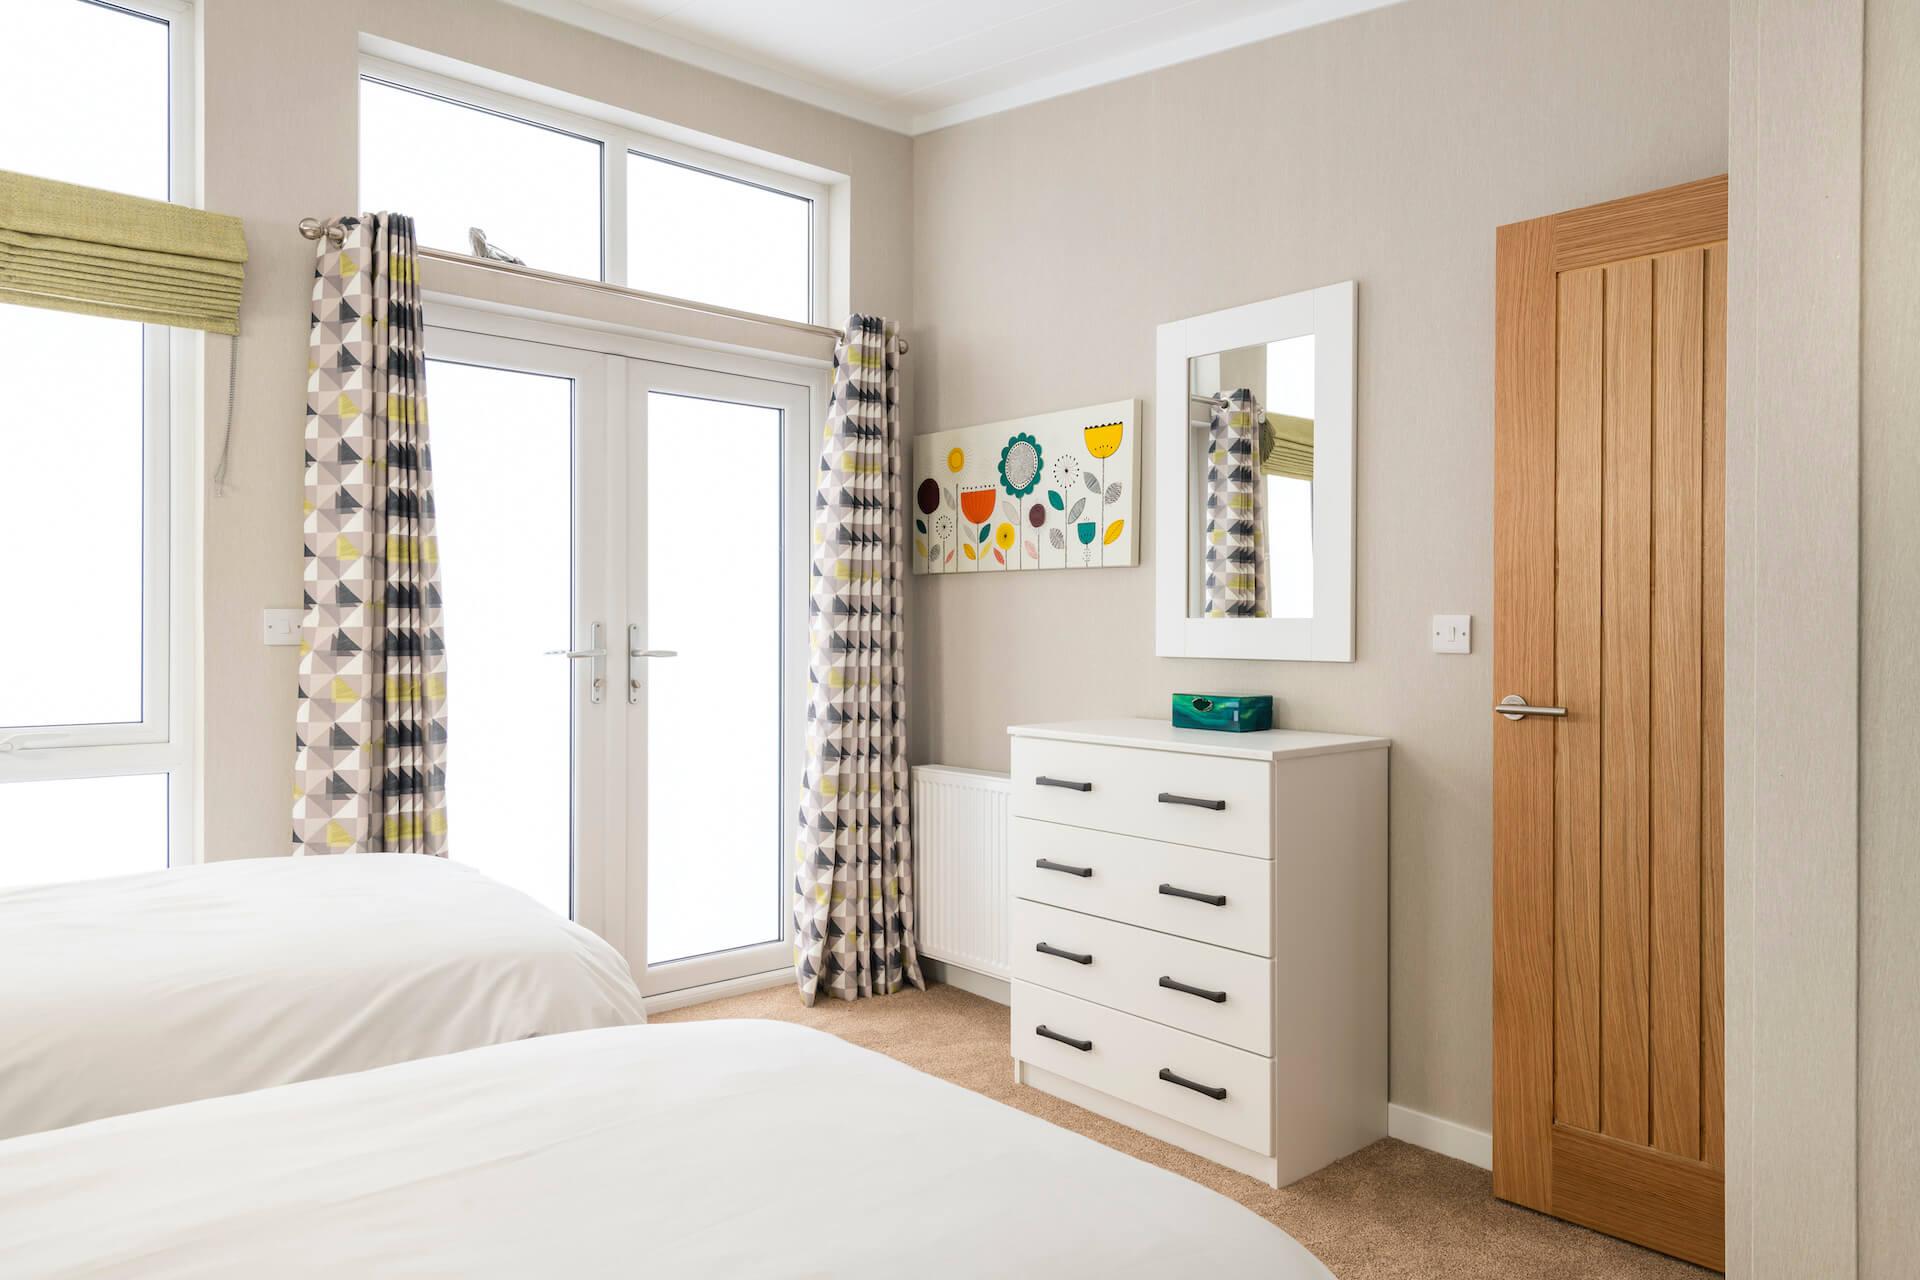 Omar-Atrium-Monopitch-Second-Bedroom